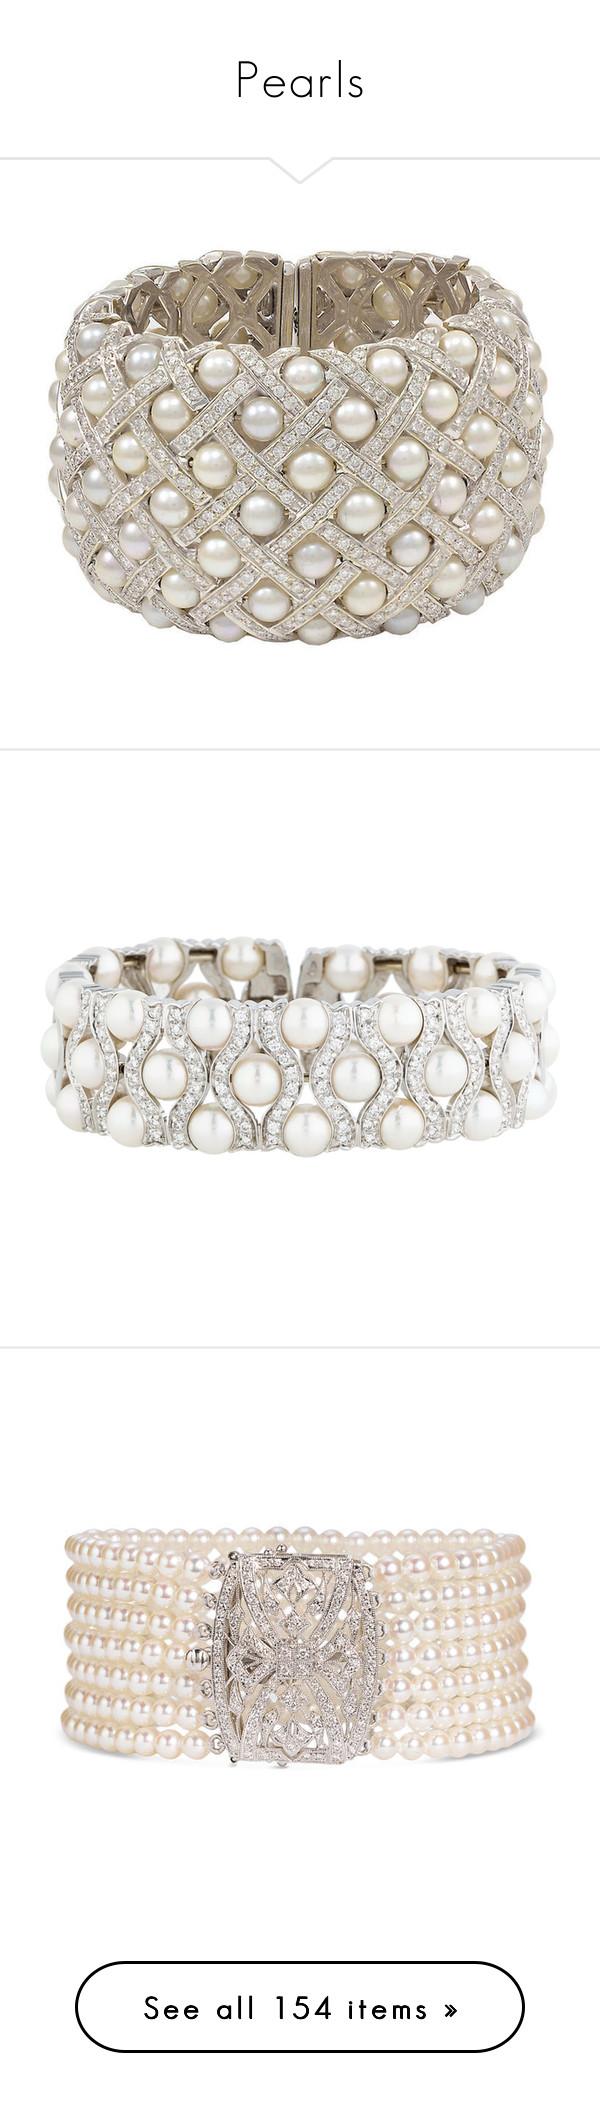 """Pearls"" by julia0331 ❤ liked on Polyvore featuring jewelry, bracelets, multiple, pearl jewellery, 18 karat gold jewelry, cuff bracelet, pearl jewelry, pearl cuff bracelet, nakit and cuff jewelry"